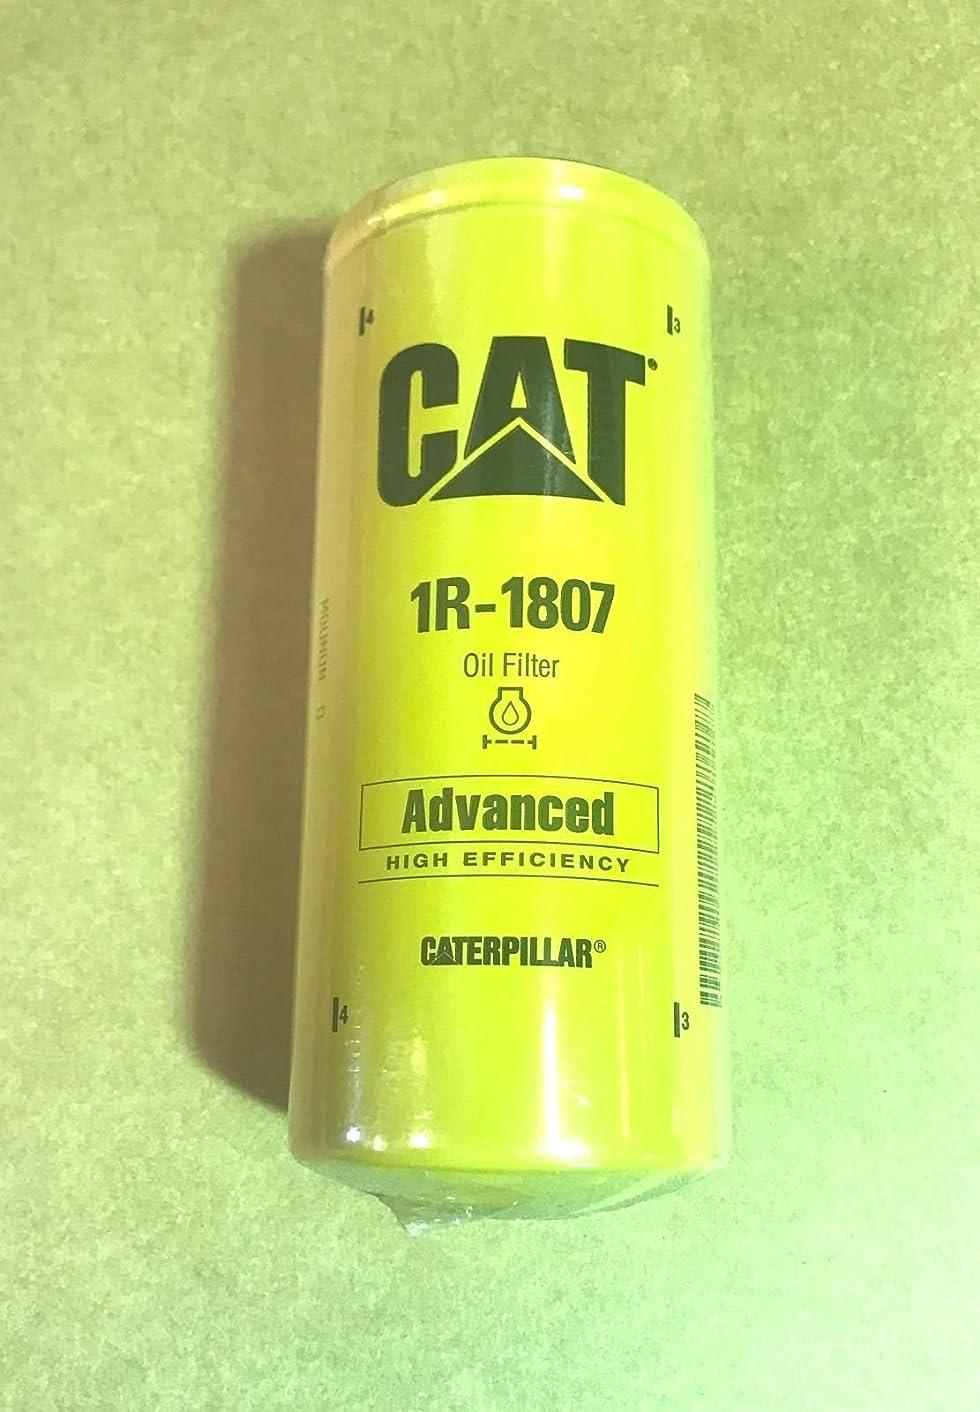 Caterpillar 1R-1807 Advanced High Efficiency Oil Filter (Pack of 1)